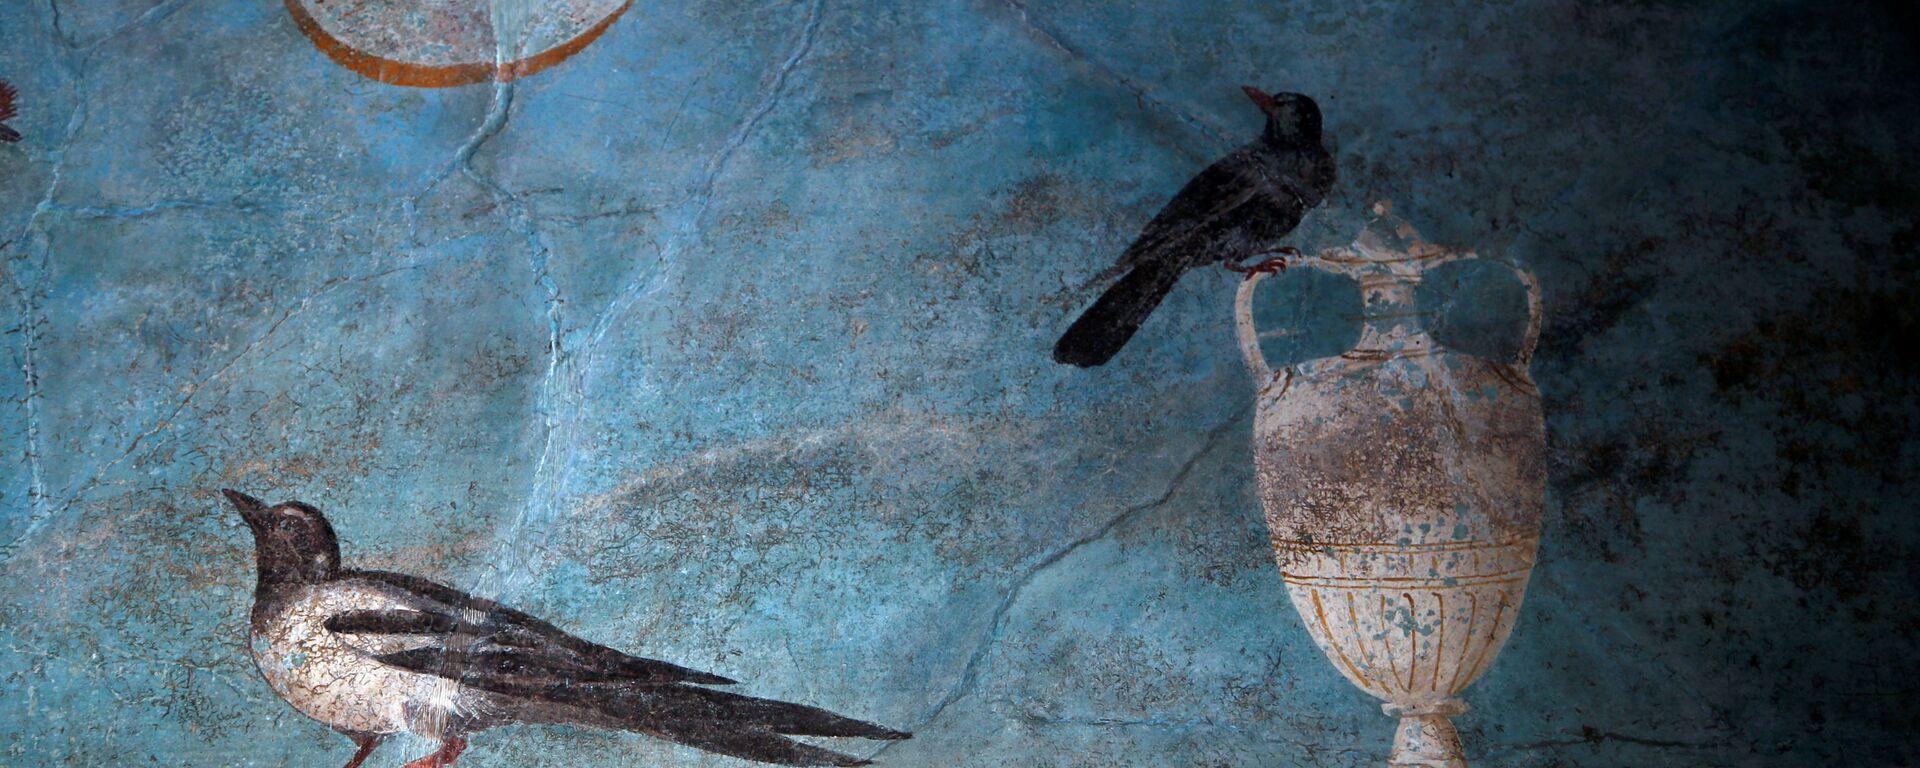 Fresk w Casa del Frutteto w Pompejach - Sputnik Polska, 1920, 19.02.2020